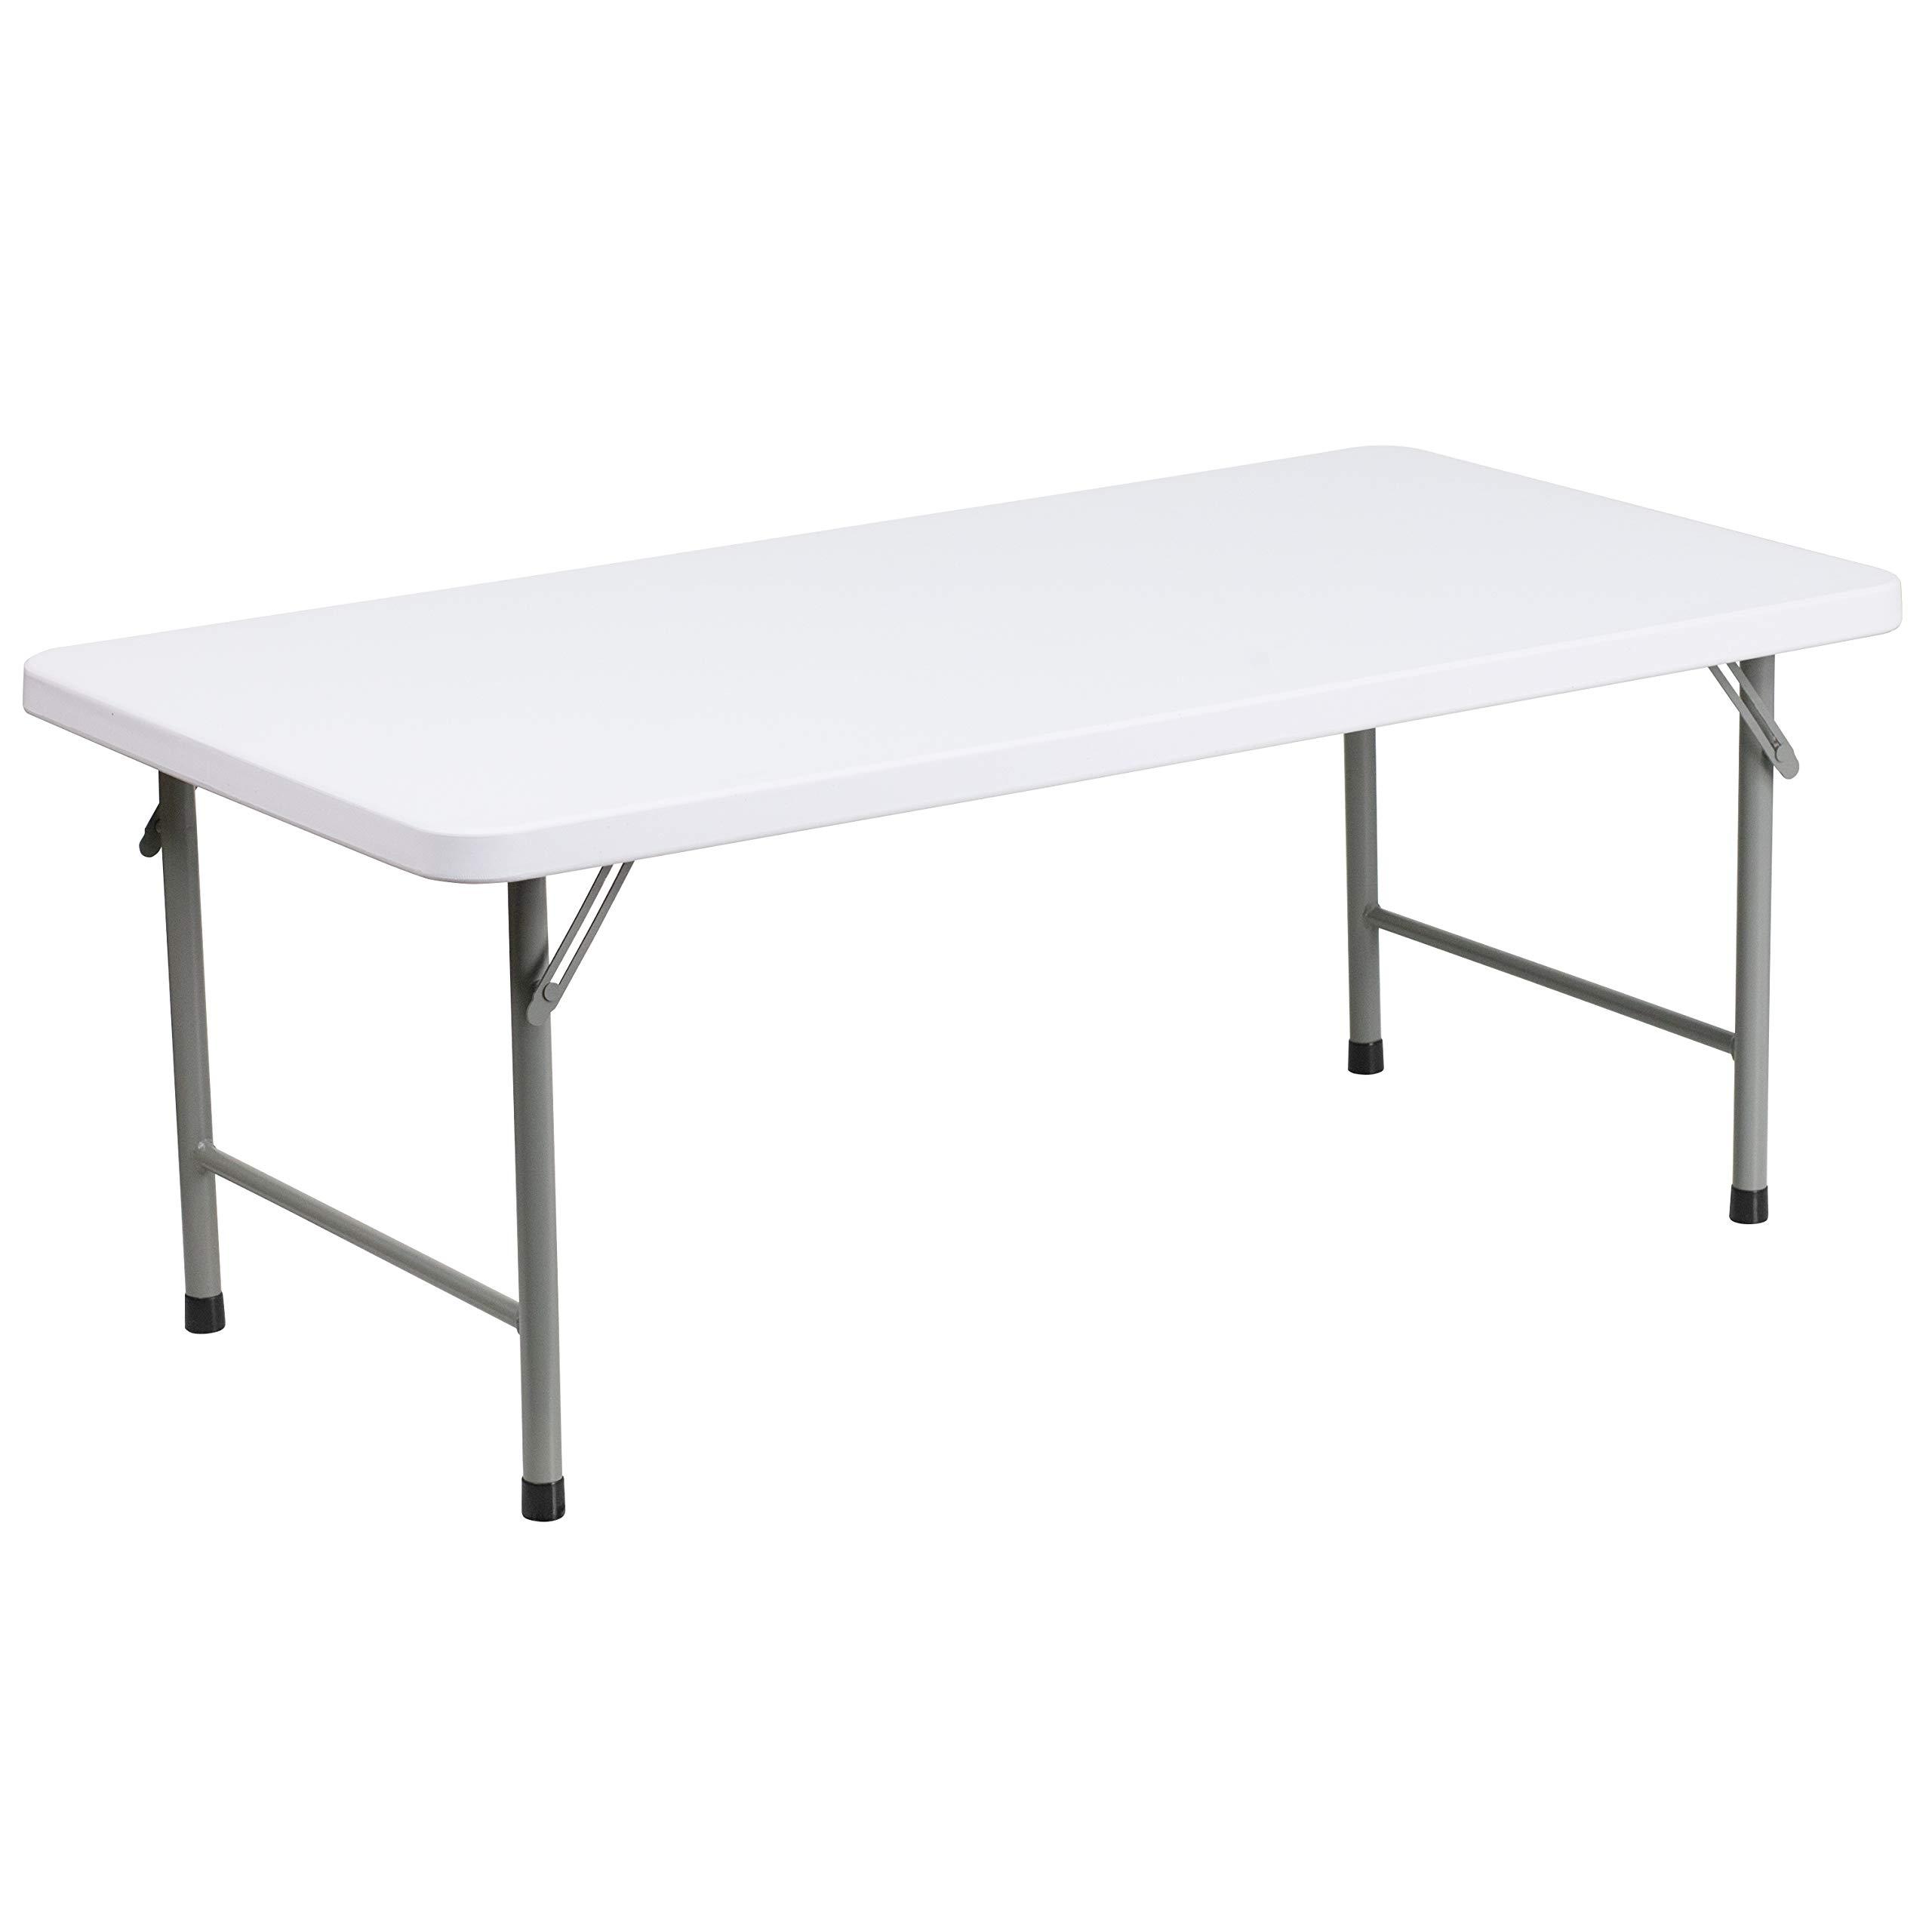 Flash Furniture 4-Foot Kid's Granite White Plastic Folding Table by Flash Furniture